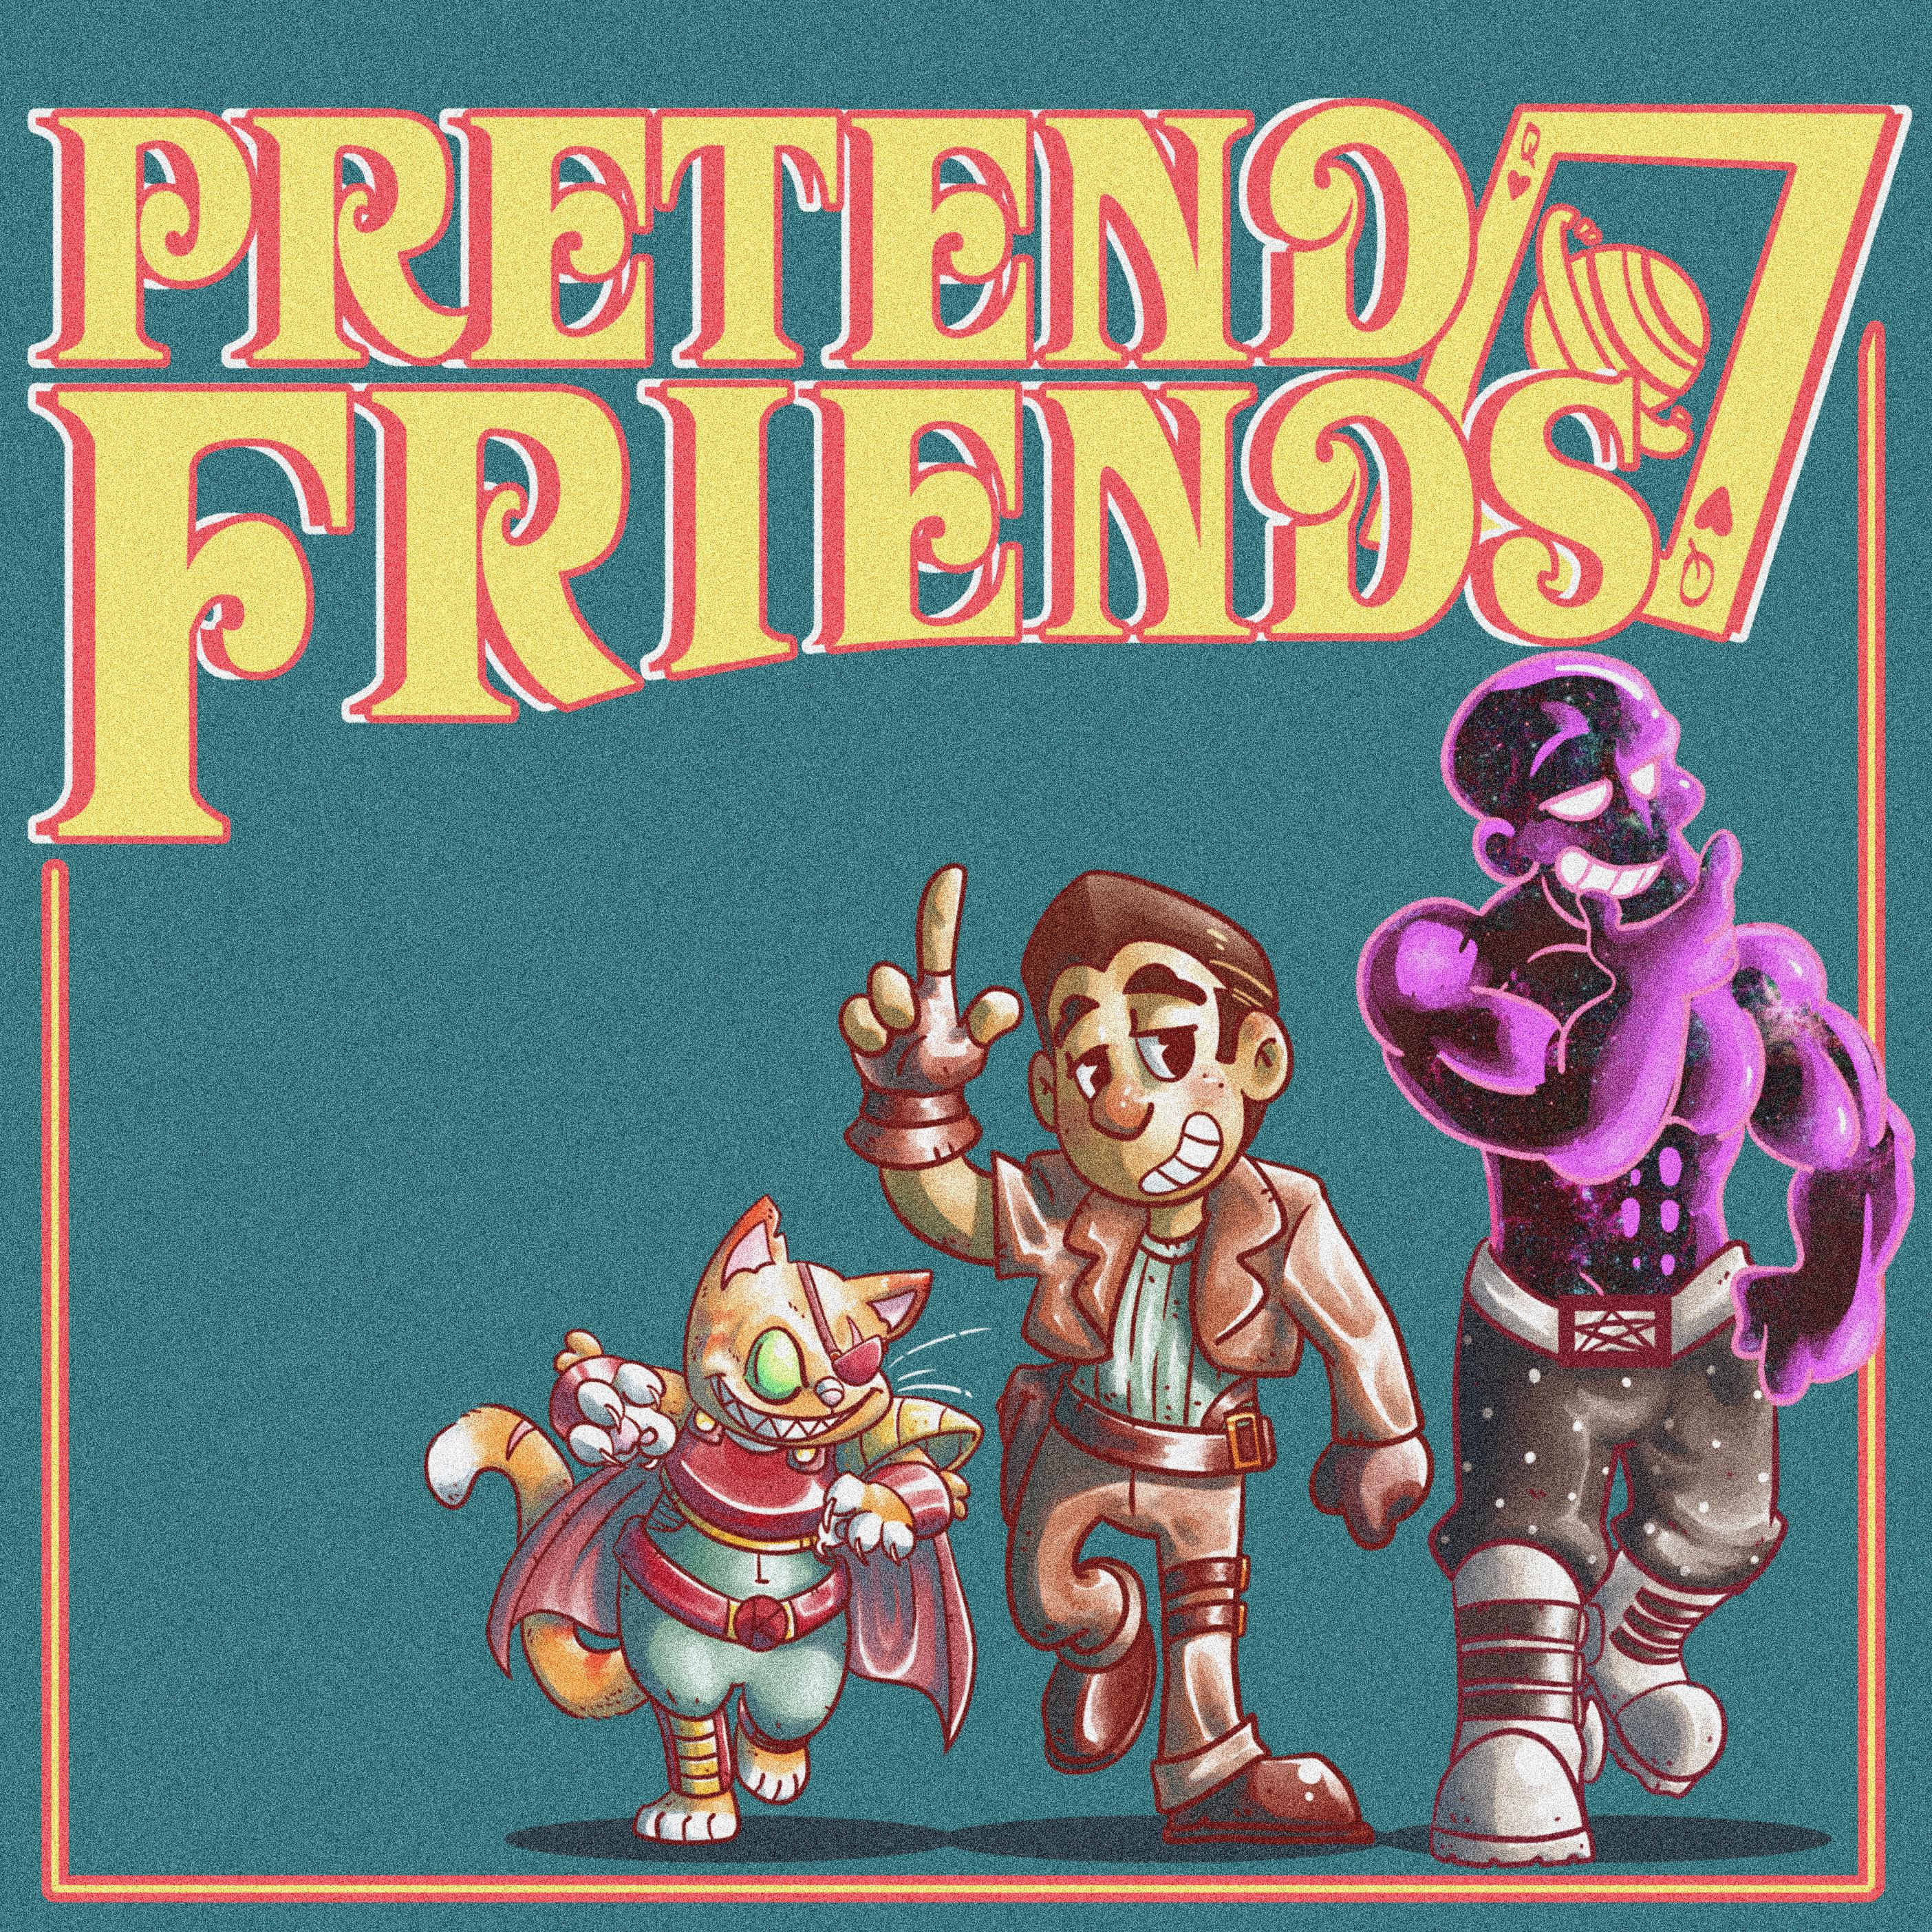 Pretend Friends - Tabletop RPG Adventures show art